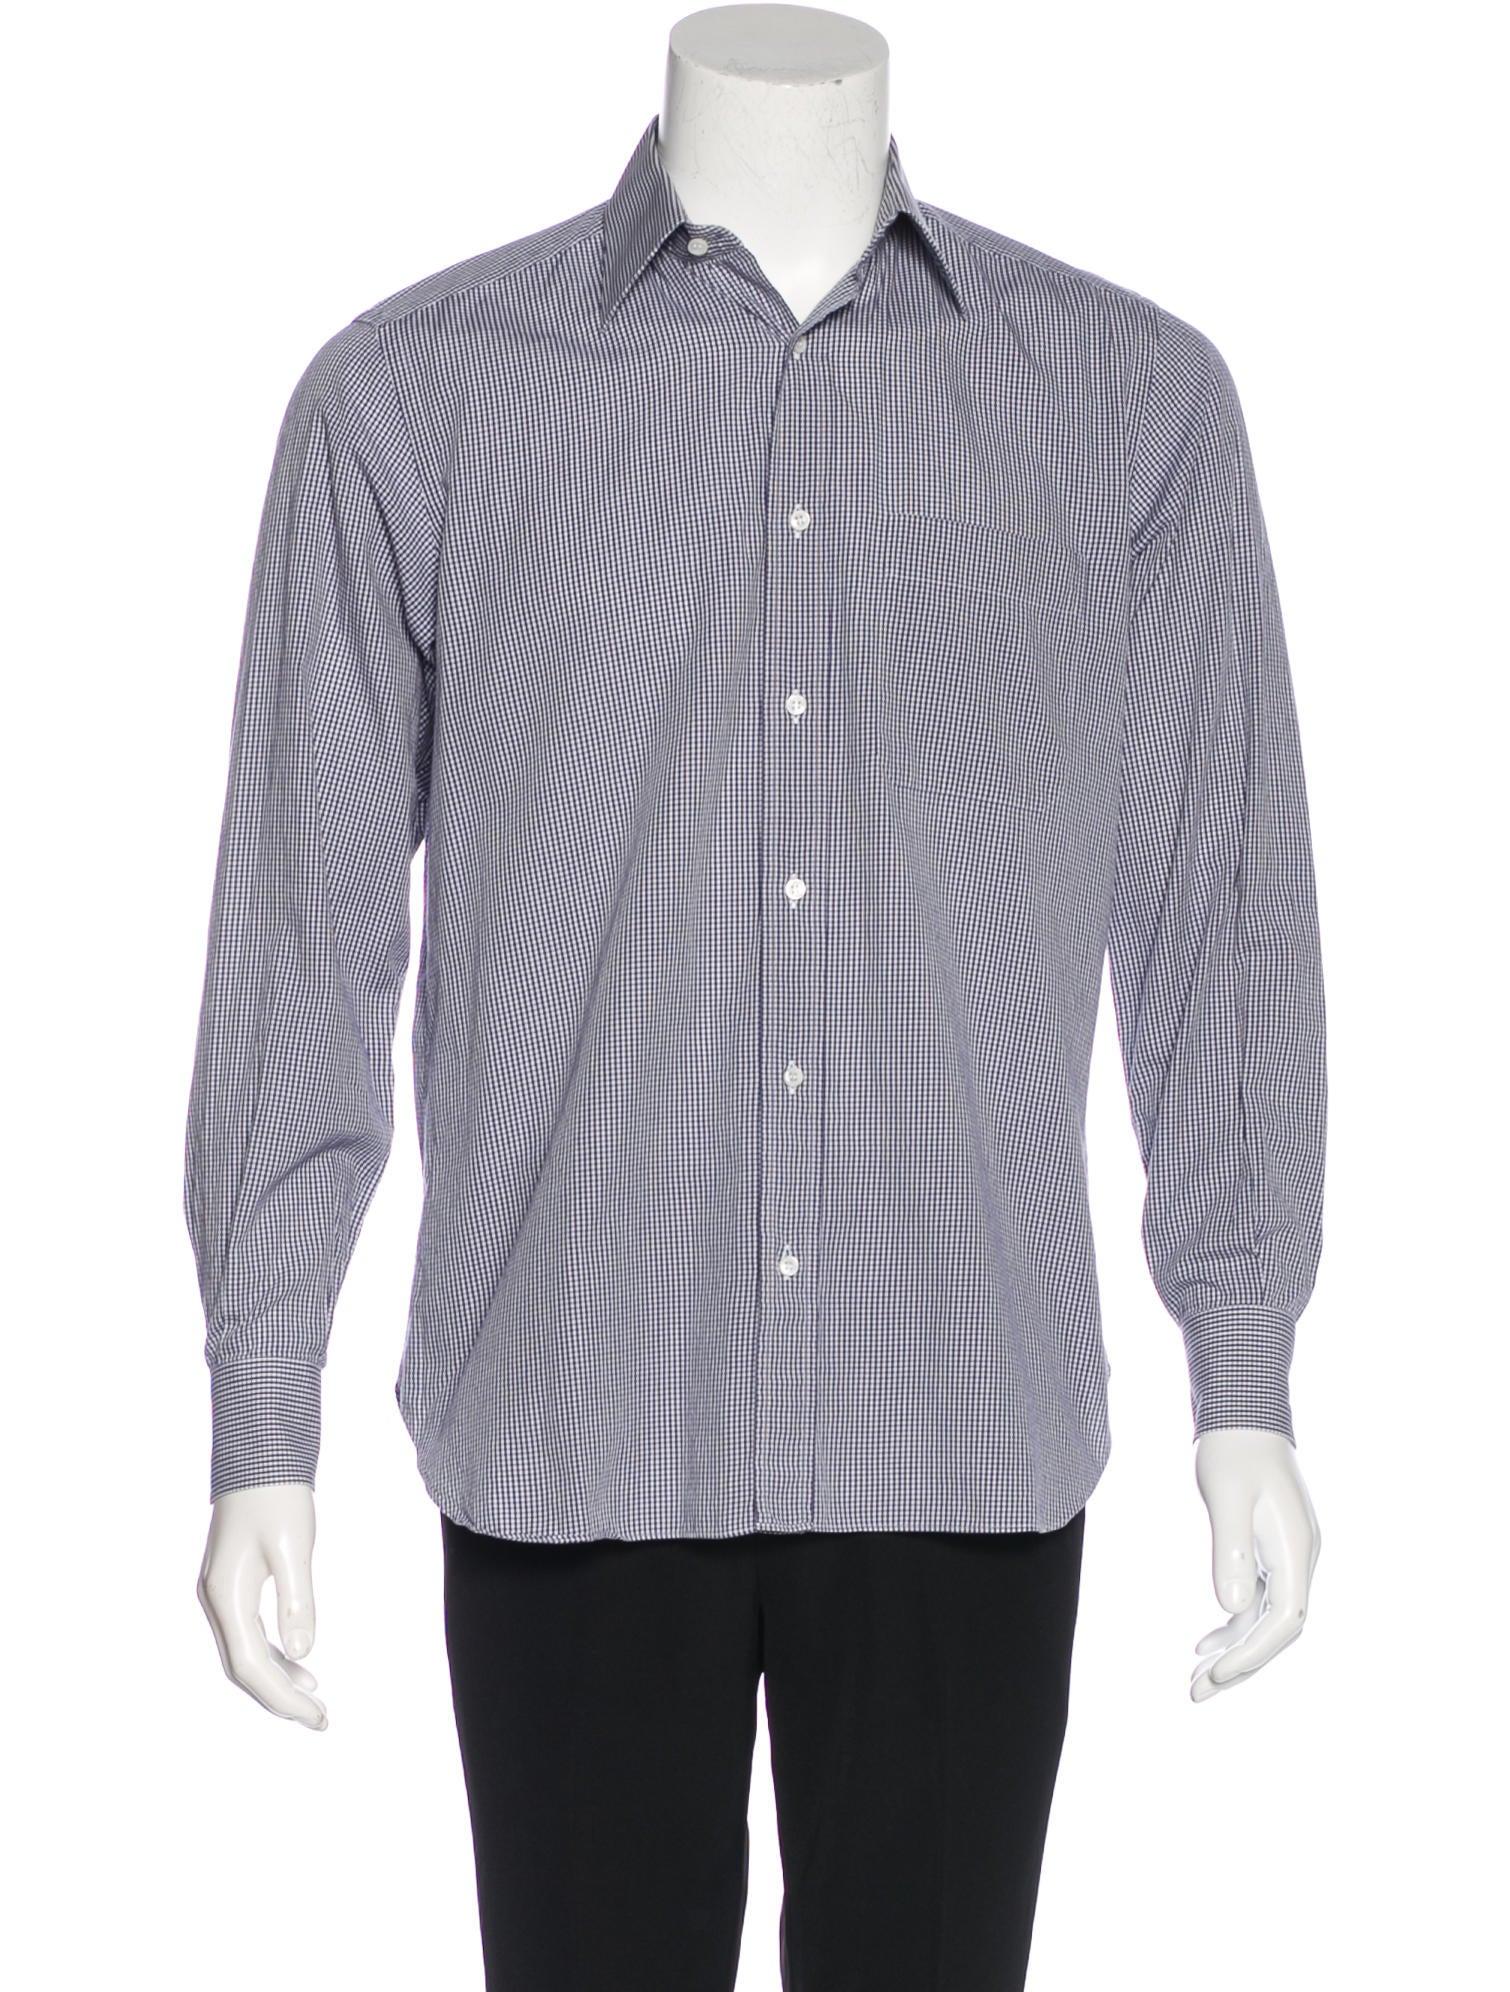 Brioni gingham dress shirt clothing bro21829 the for Men s red gingham dress shirt